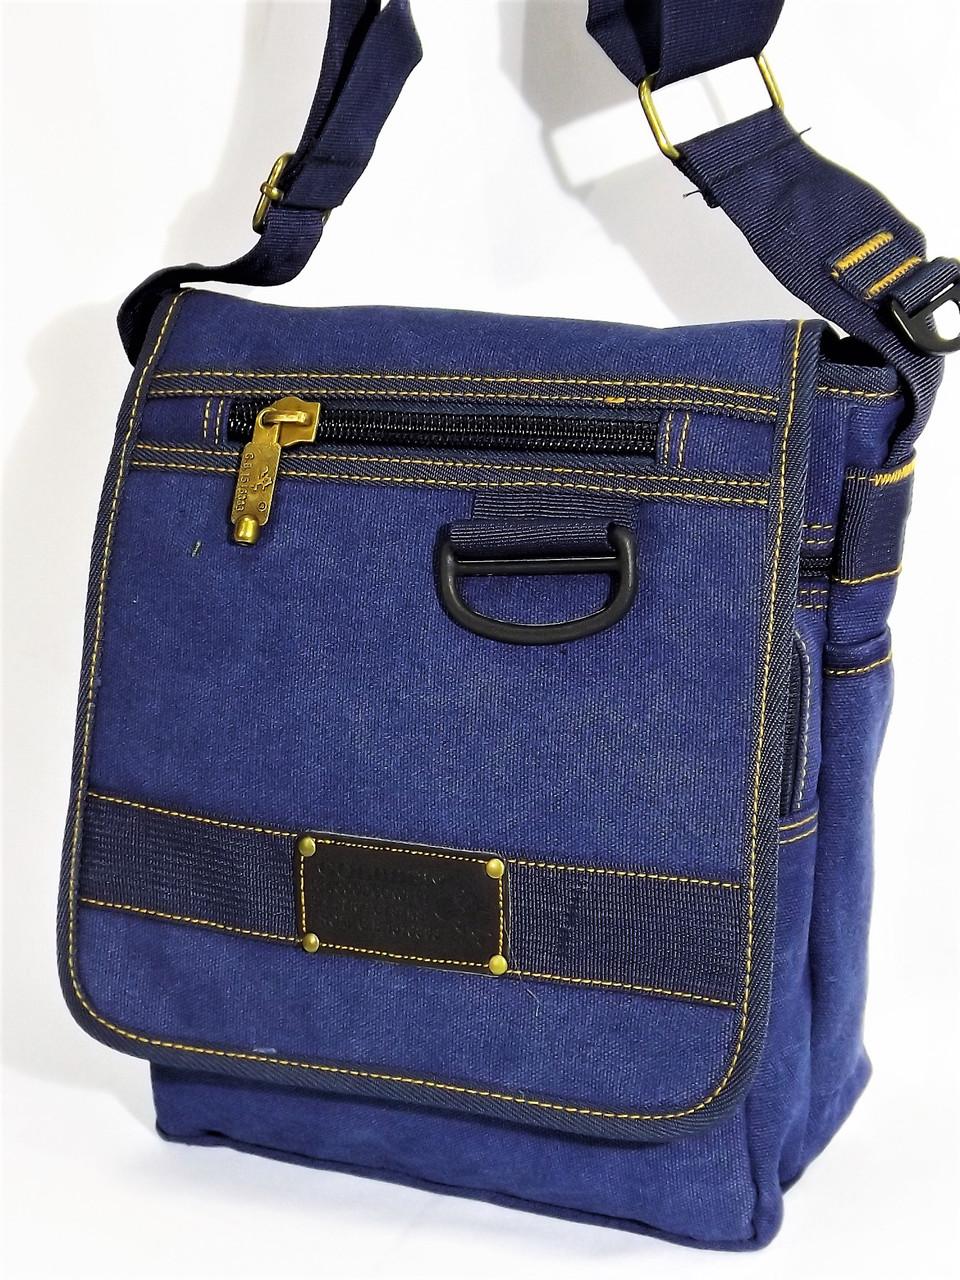 c98bde97e0df Молодежная брезентовая сумка на плечо Gold be! 103 синяя - интернет-магазин